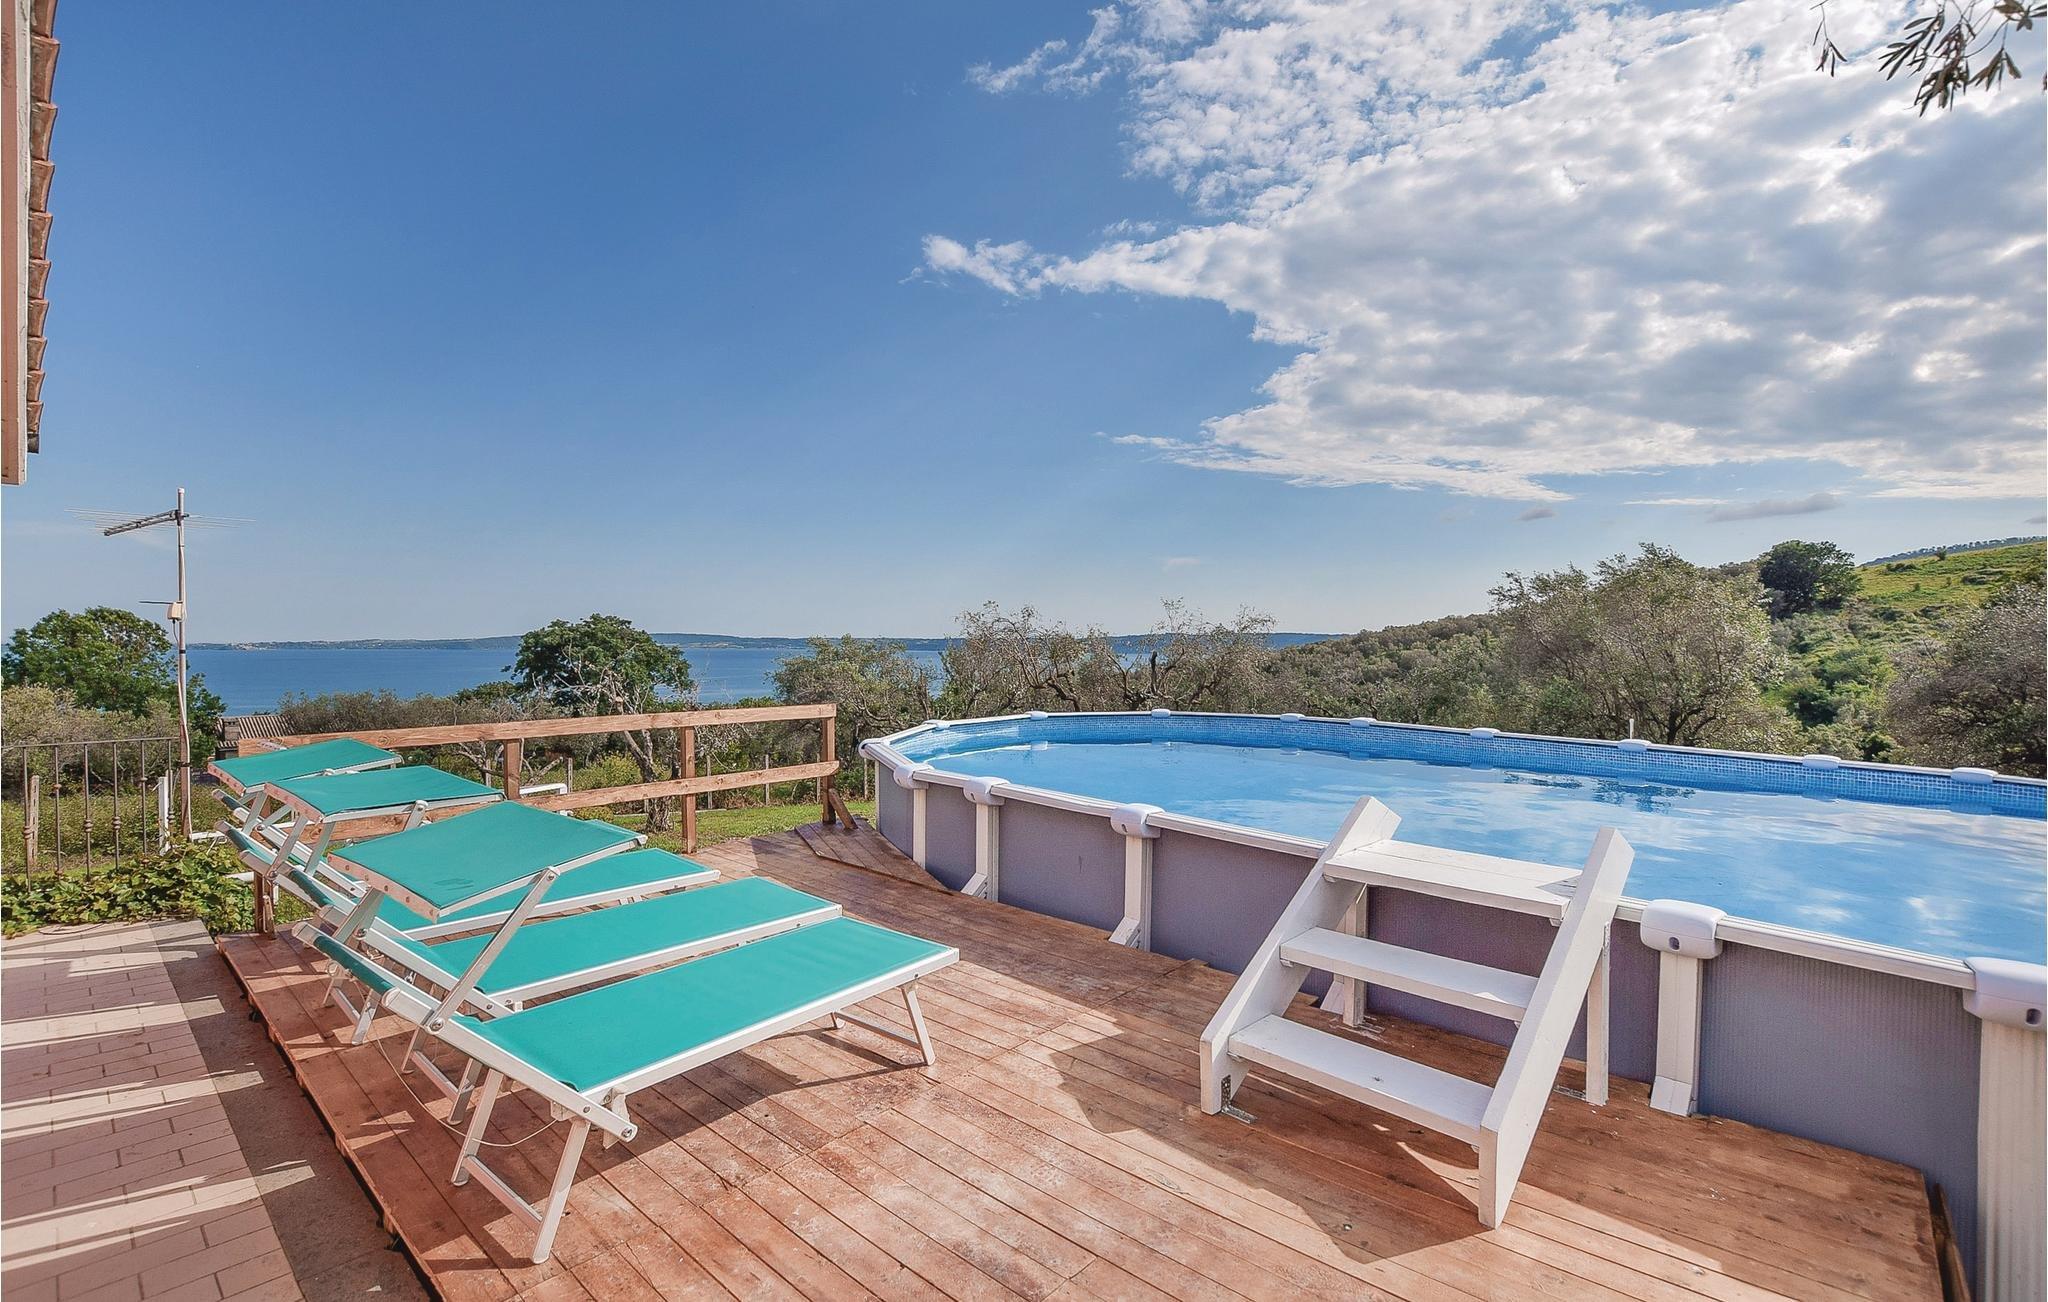 2 Bedroom Villa In Bracciano | Alpha Holiday Lettings